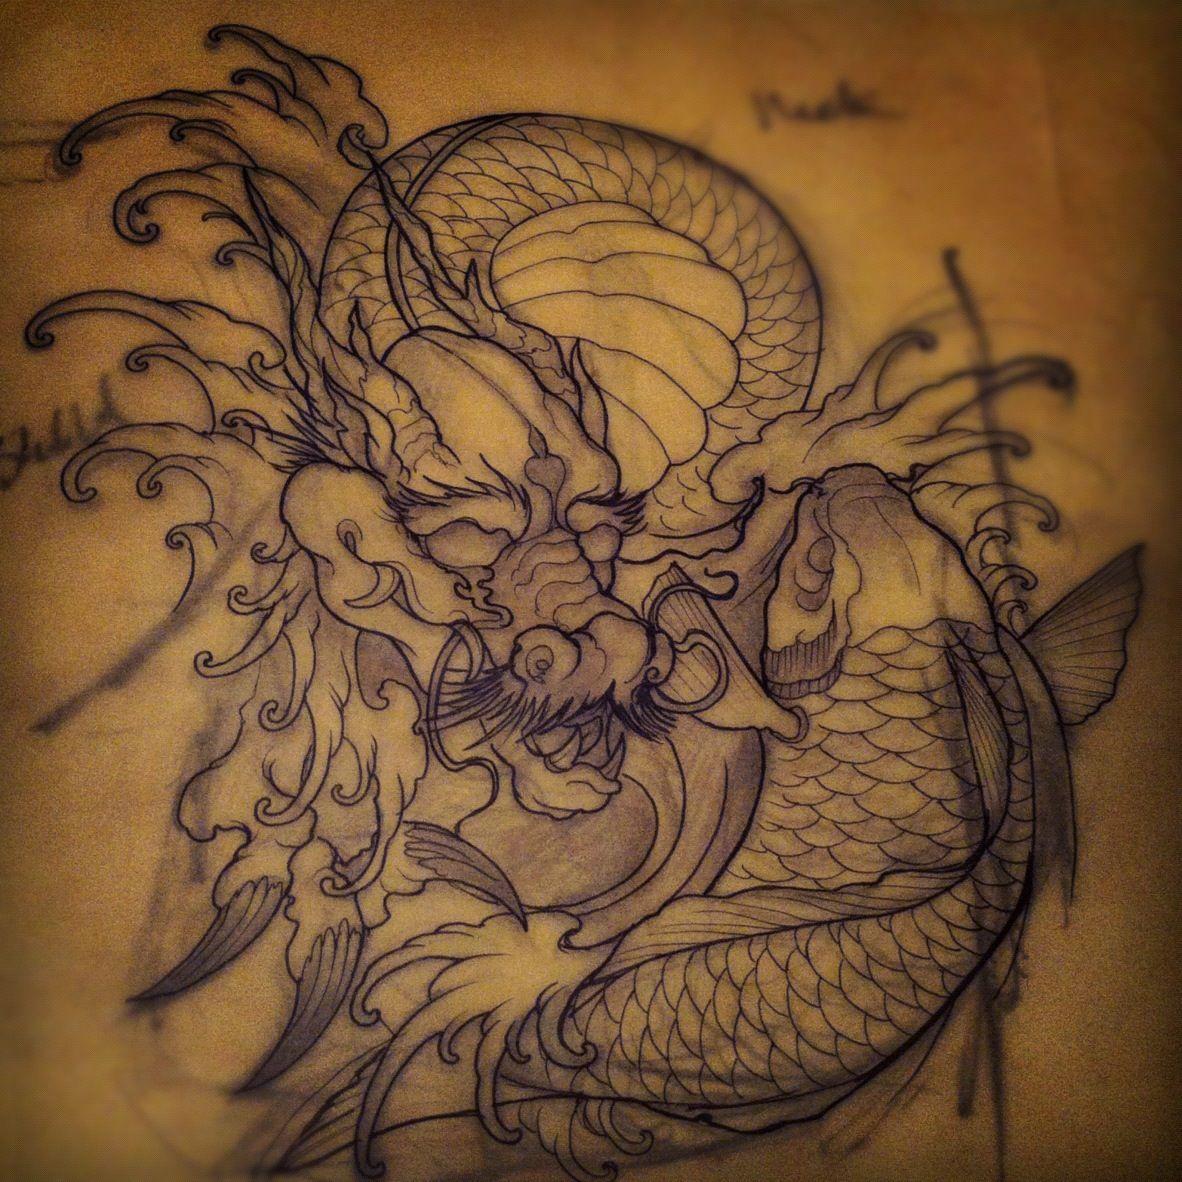 Family Tattoo Ideas Buscar Con Google: KOI Y DRAGONES - Buscar Con Google